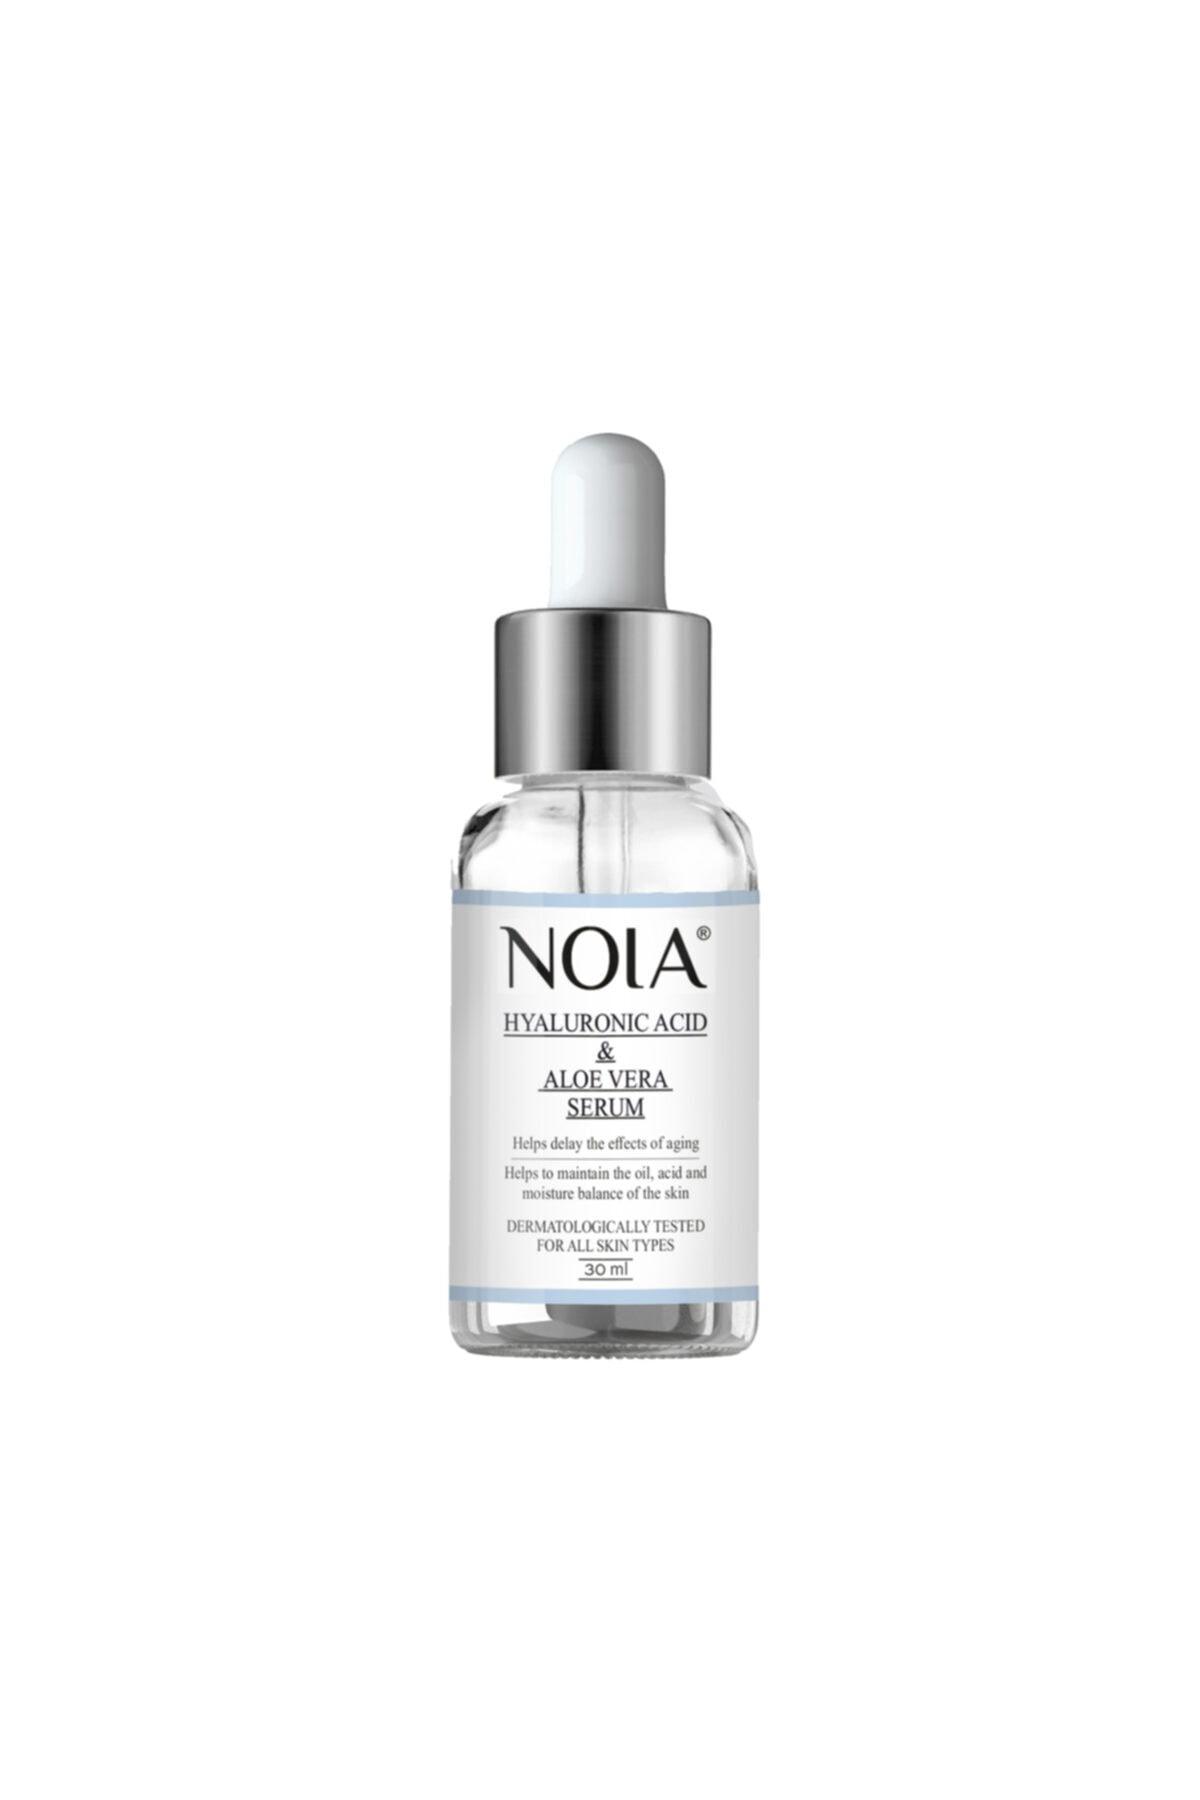 Noia Hyaluronic Acid & Aloe Vera Serum 1